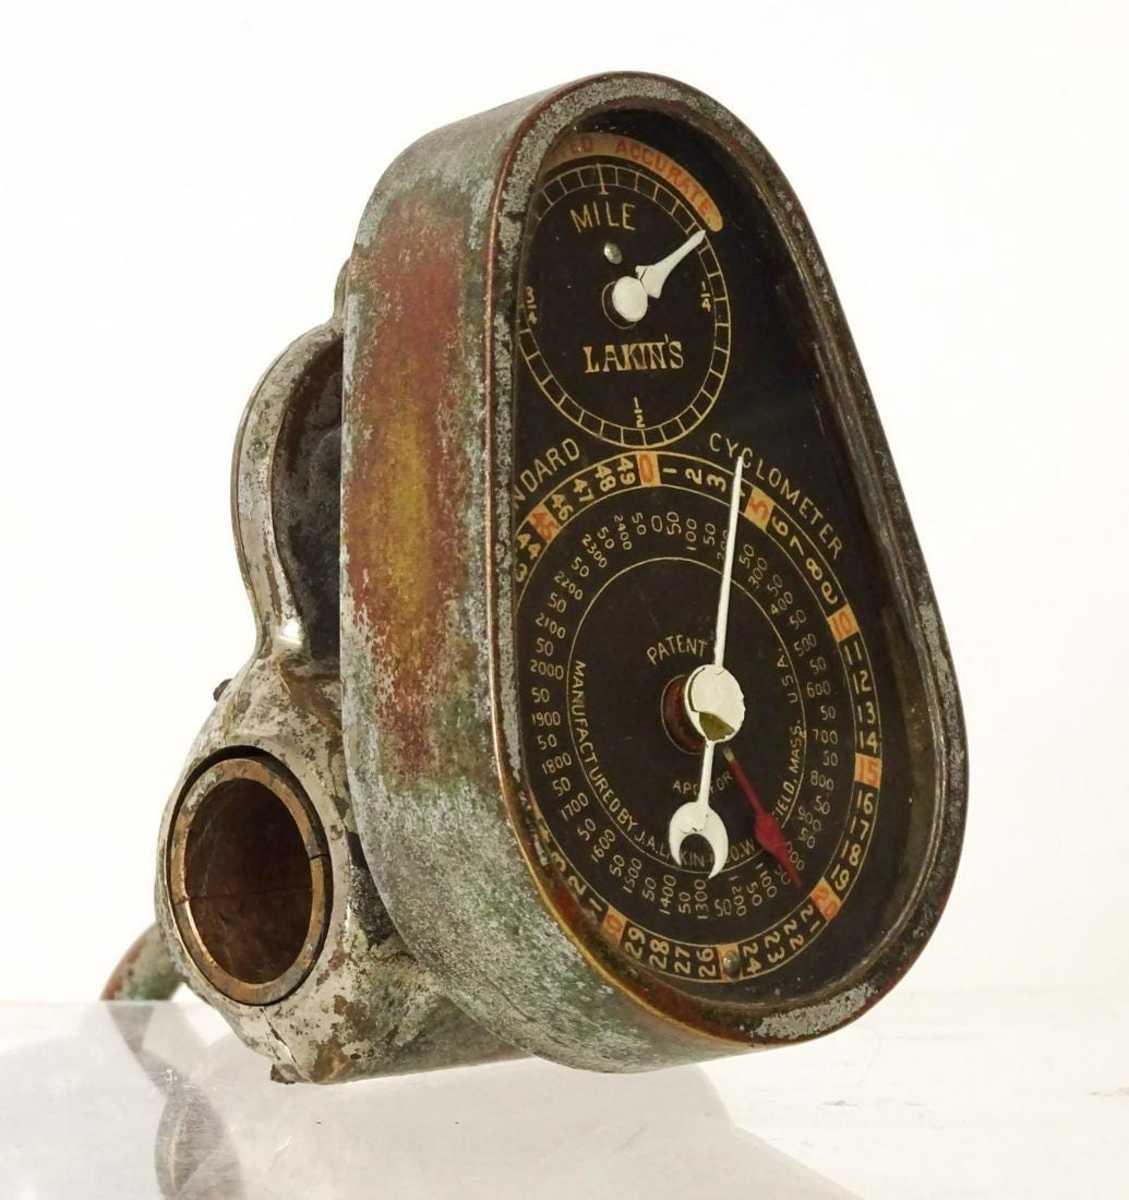 "Rare 54"" Lakin's High Wheel #986 Cyclometer, approx. 5-1/2"" l. Est: $2,000-$2,500."